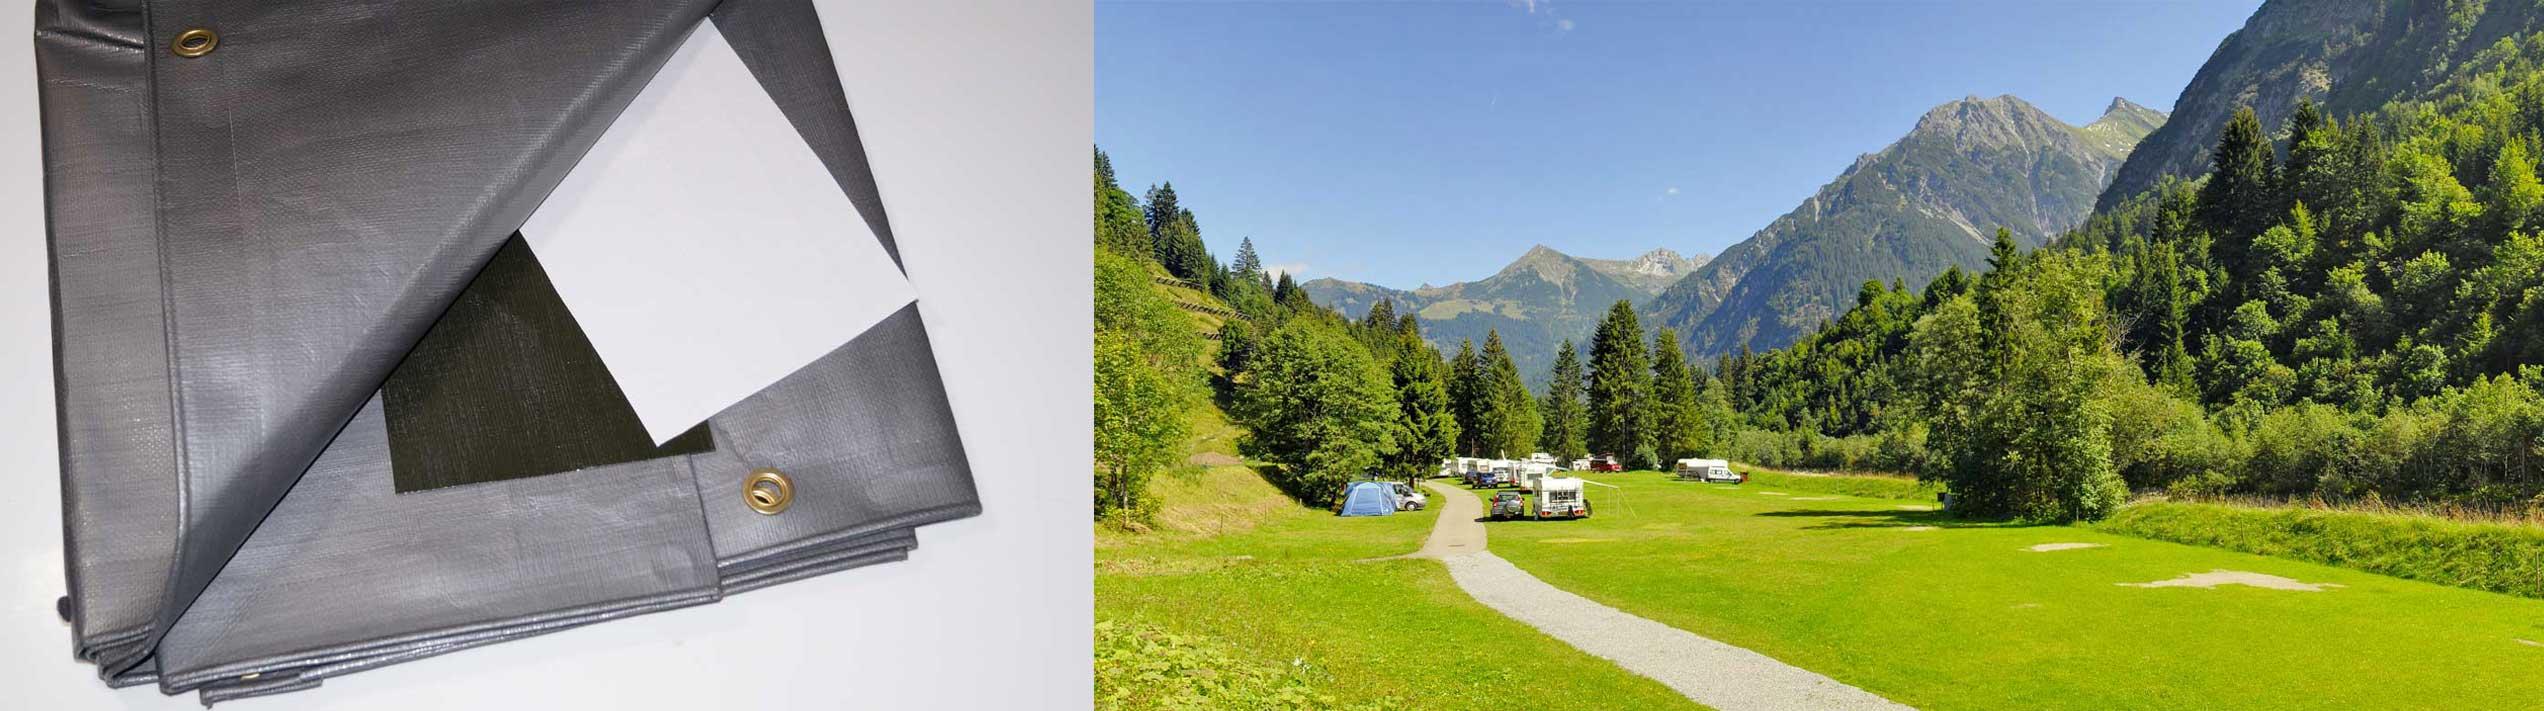 Schutzplane Camping